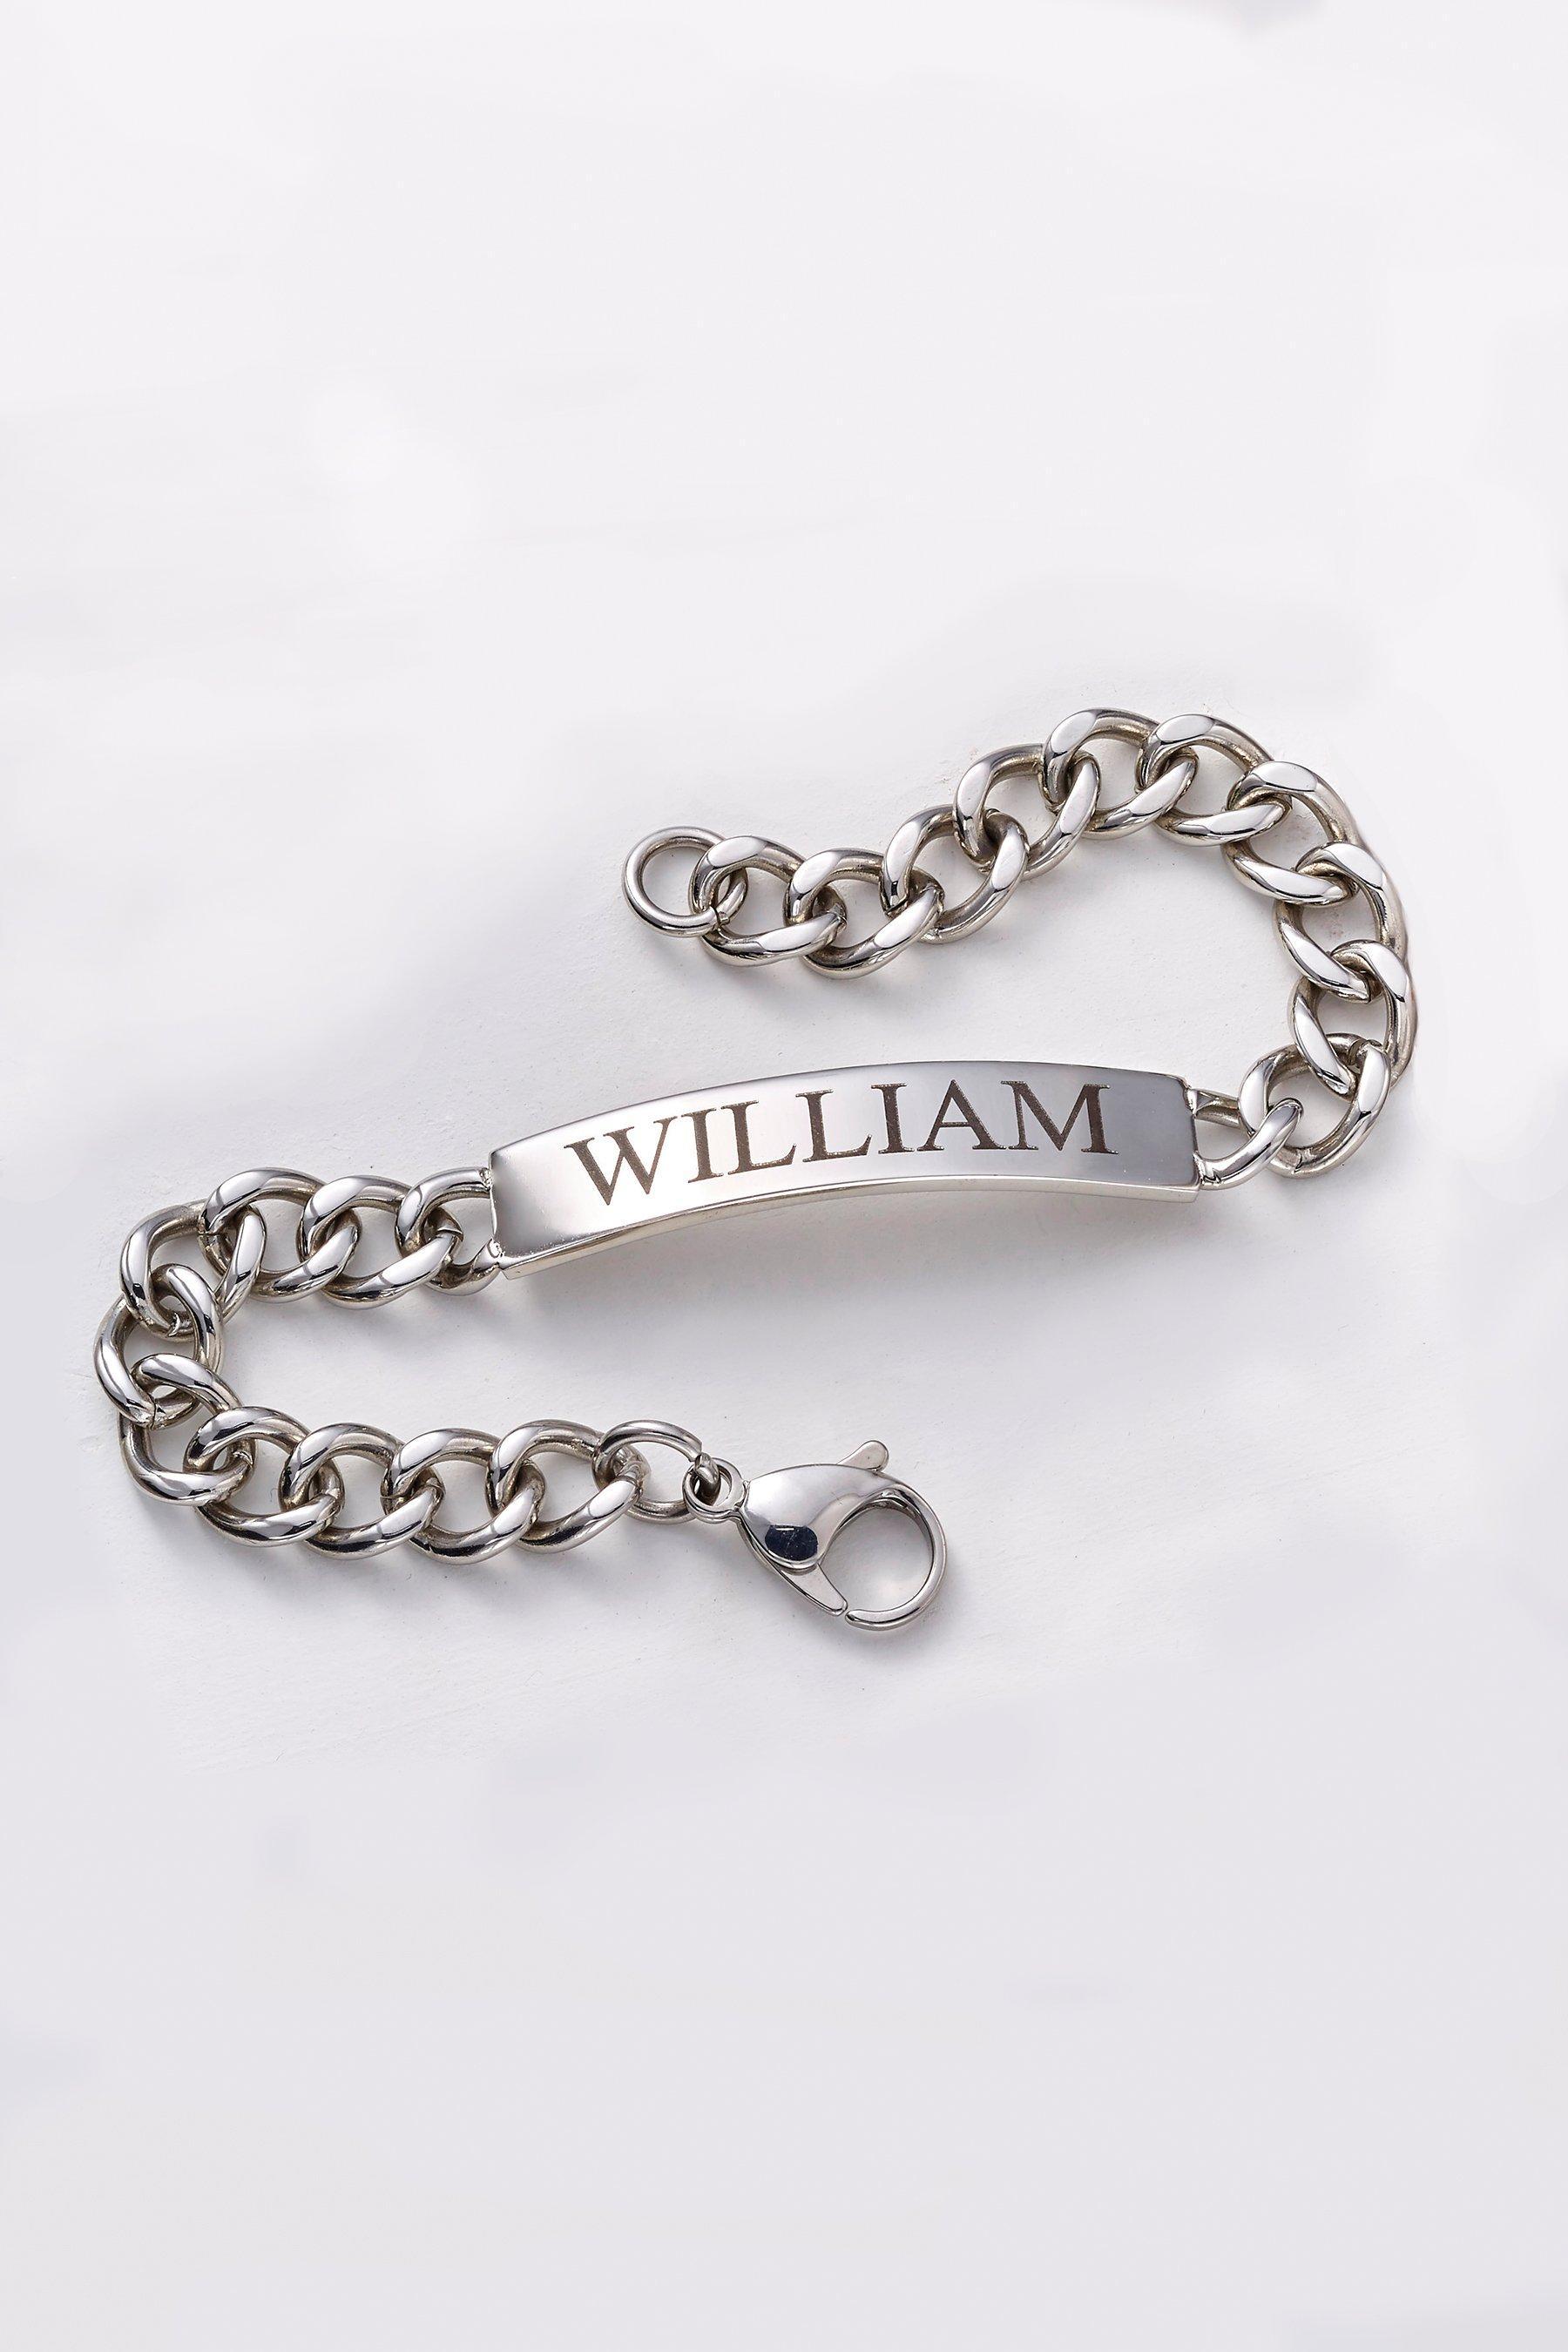 personalised stainless steel 8 1/2 inch bracelet